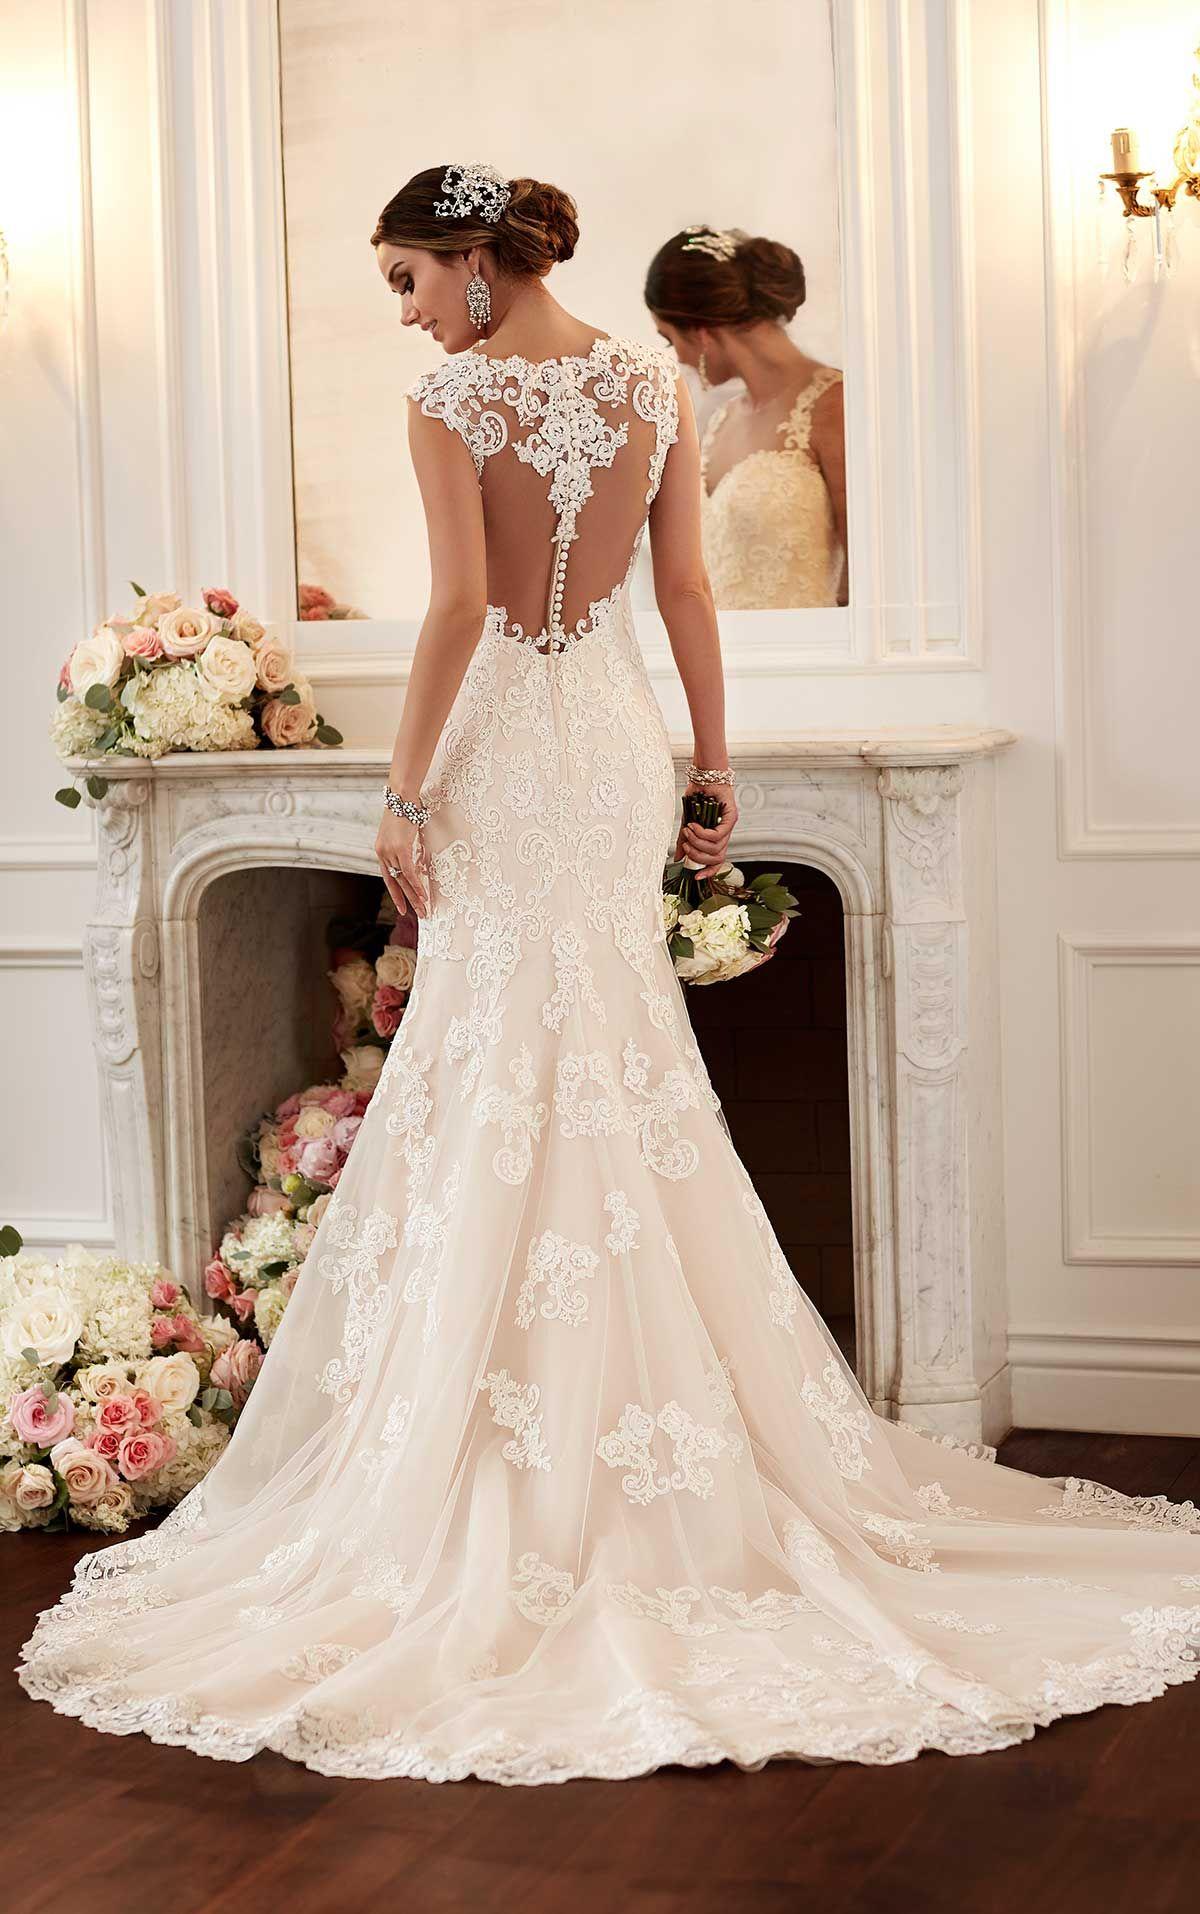 Mooiste Bruidsjurken.De Mooiste Ruggen Uit De 2016 Bruidsmode Collecties In White My